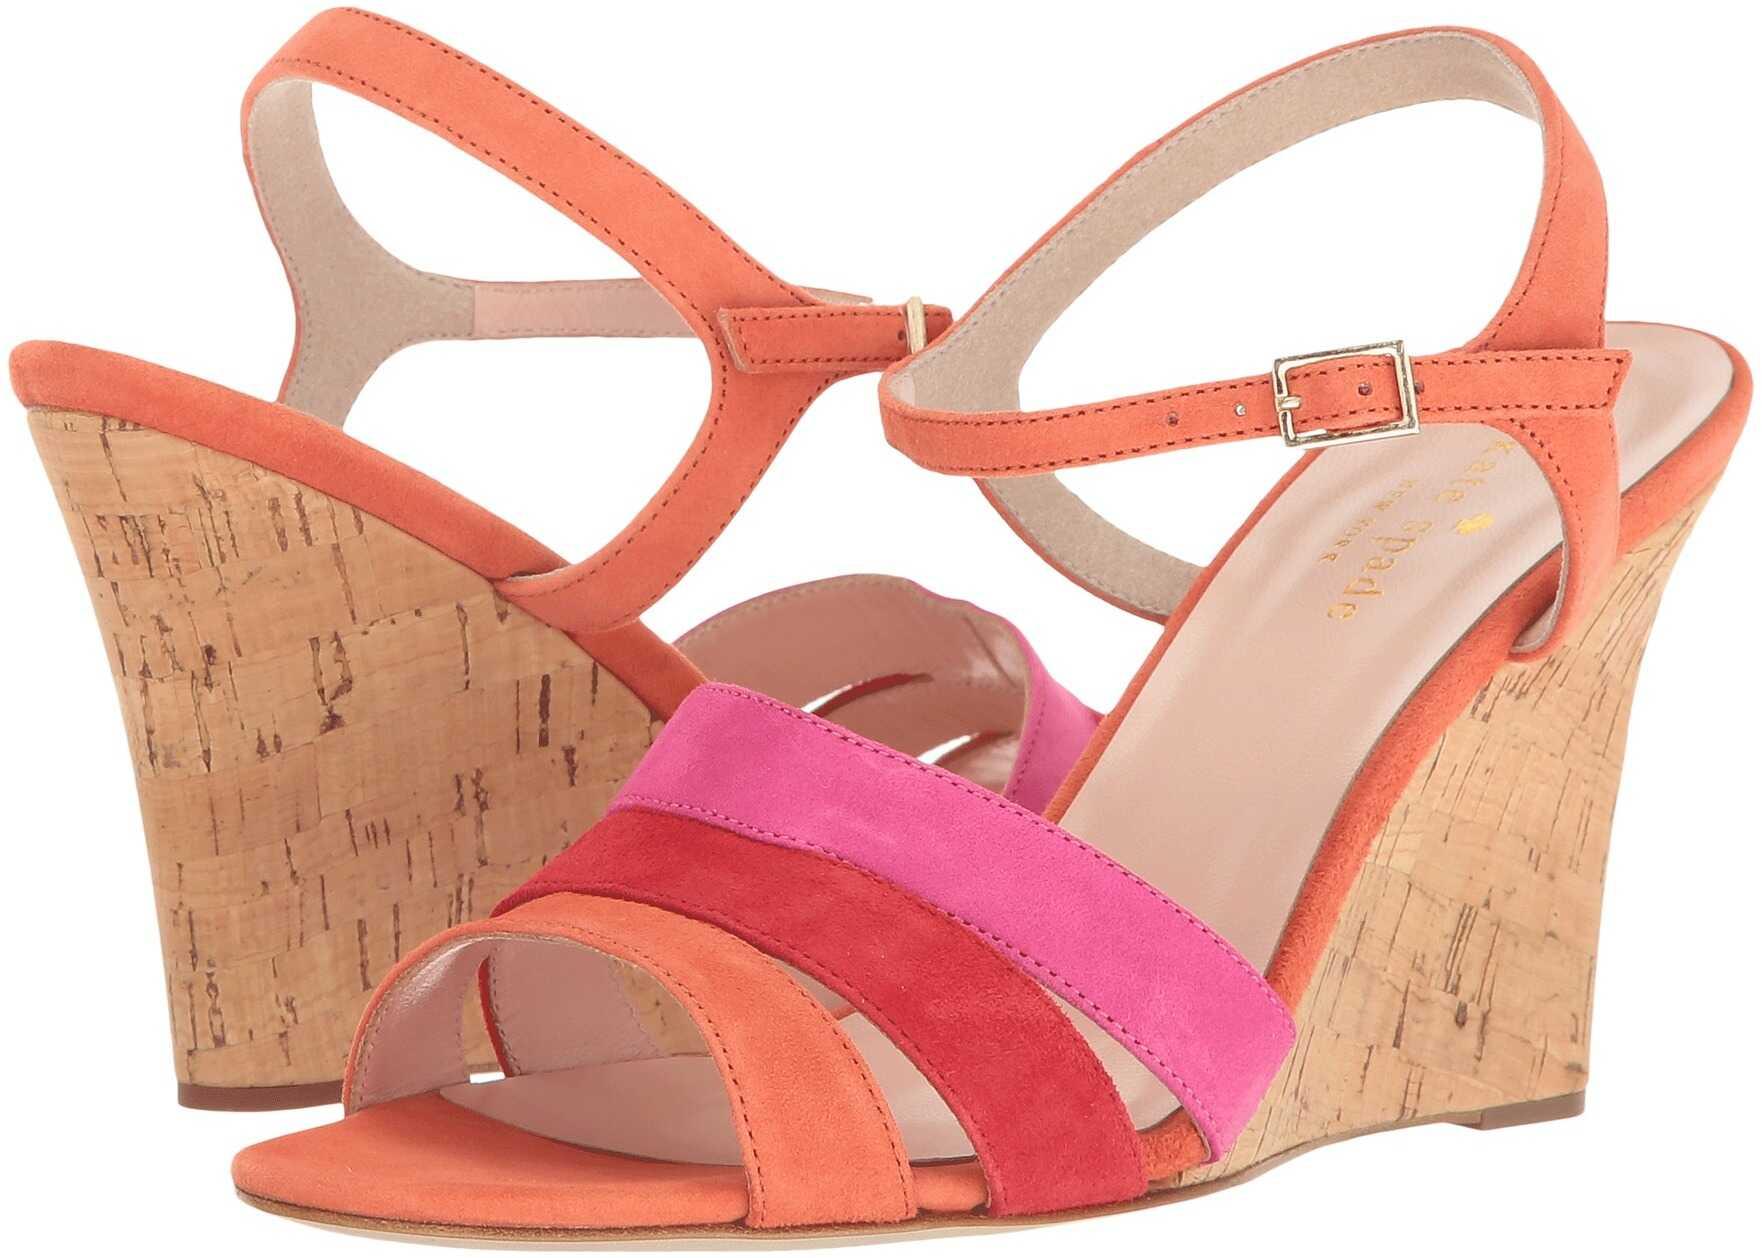 Kate Spade New York Tamara* Orange/Poppy Red/Pink Swirl Kid Suede